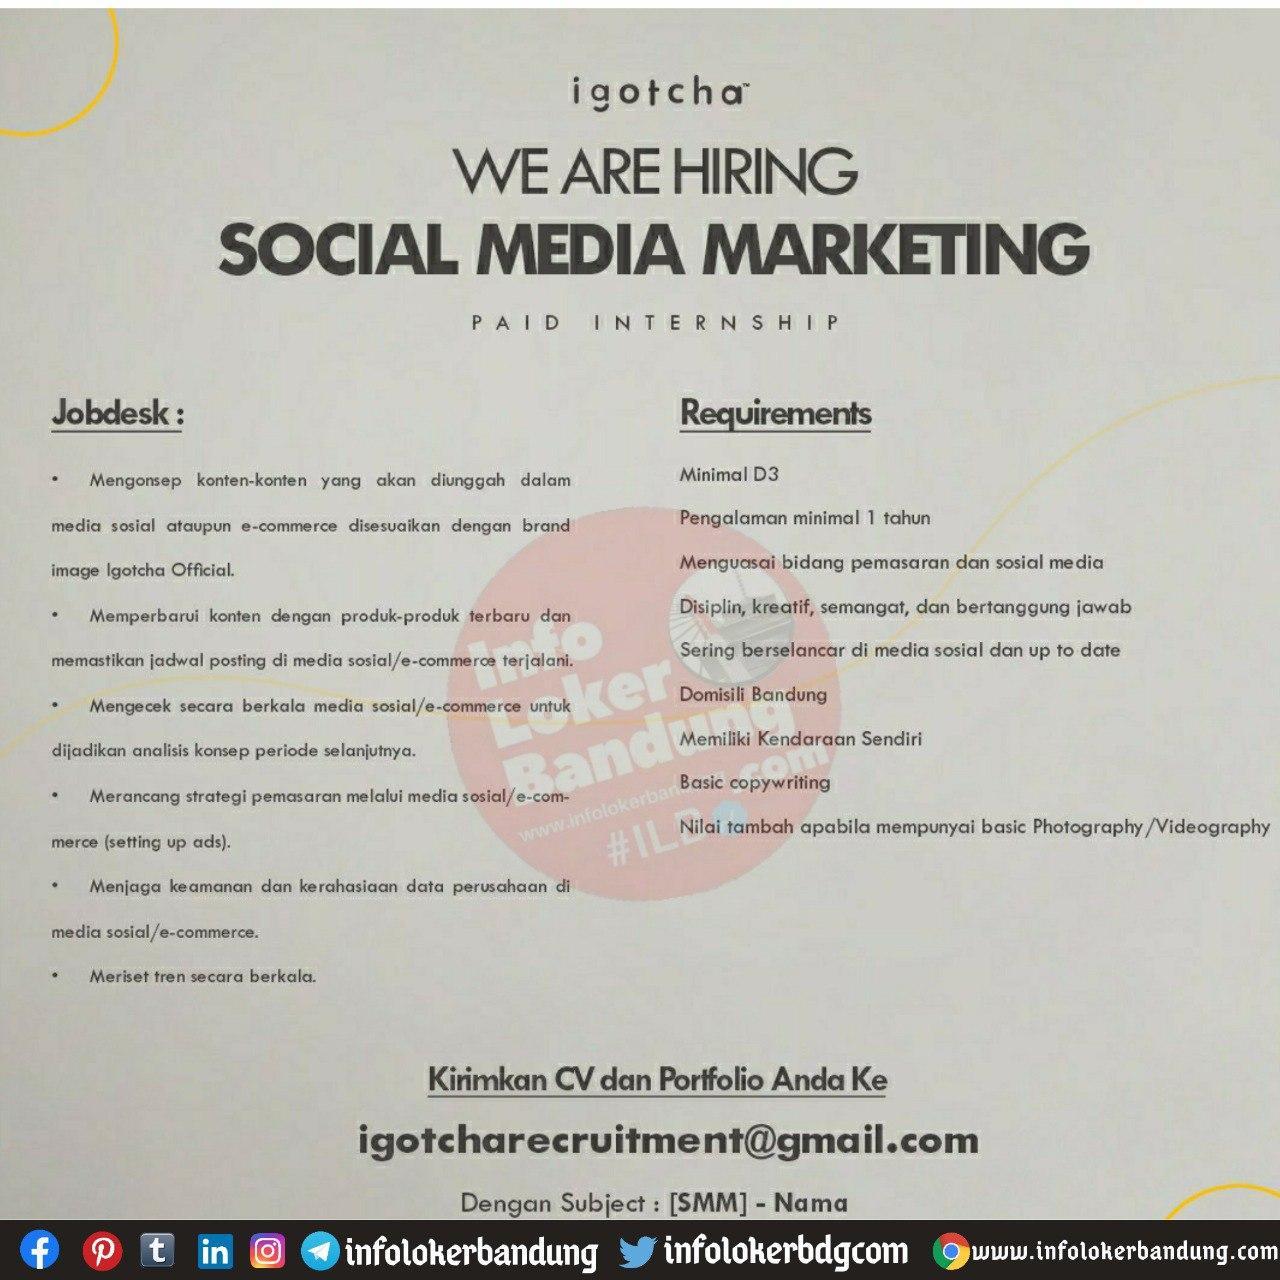 Lowongan Kerja Social Media Marketing ( Paid Internship ) Igiotcha Bandung Oktober 2020